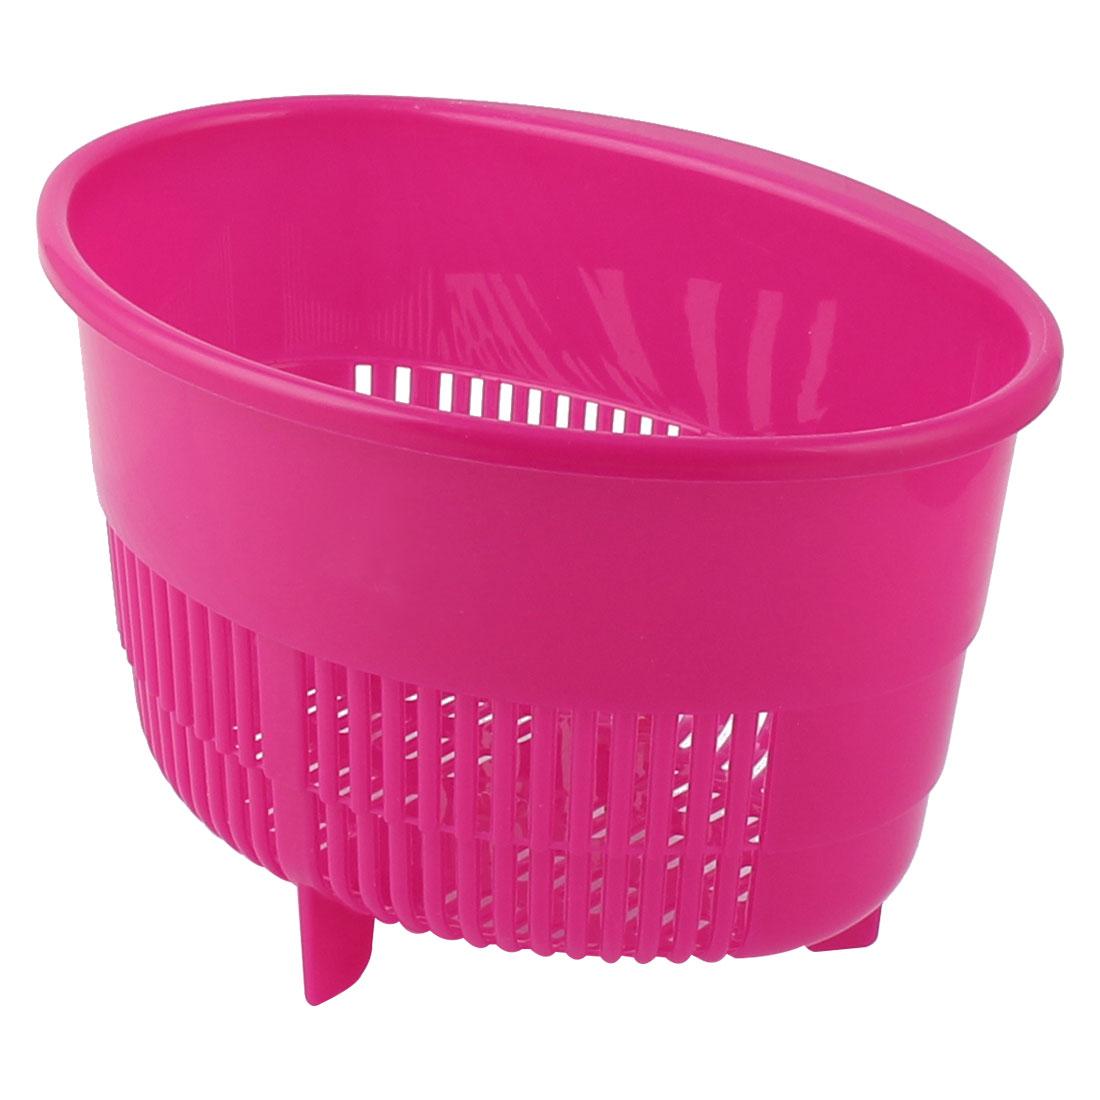 Household Kitchen Bathroom Plastic Oval Shaped Fruit Vegetables Drain Basket Holder Container Fuchsia